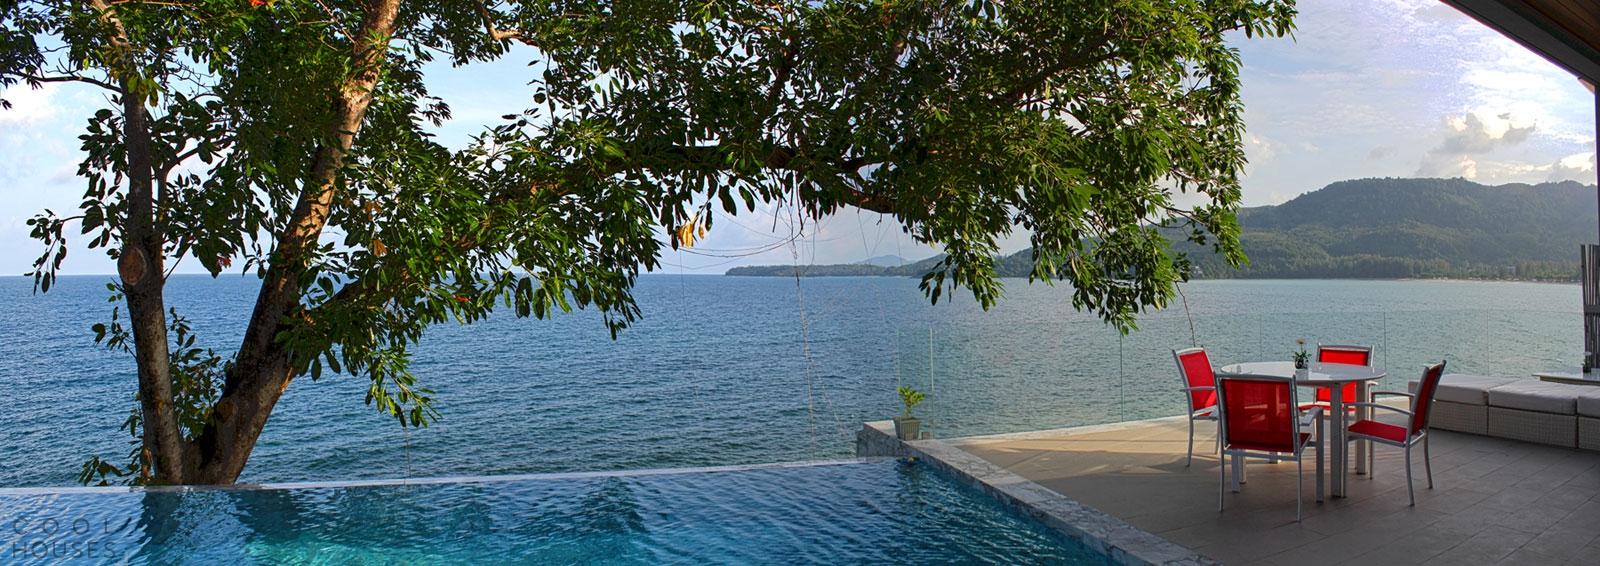 Элитная вилла на острове Пхукет, Таиланд